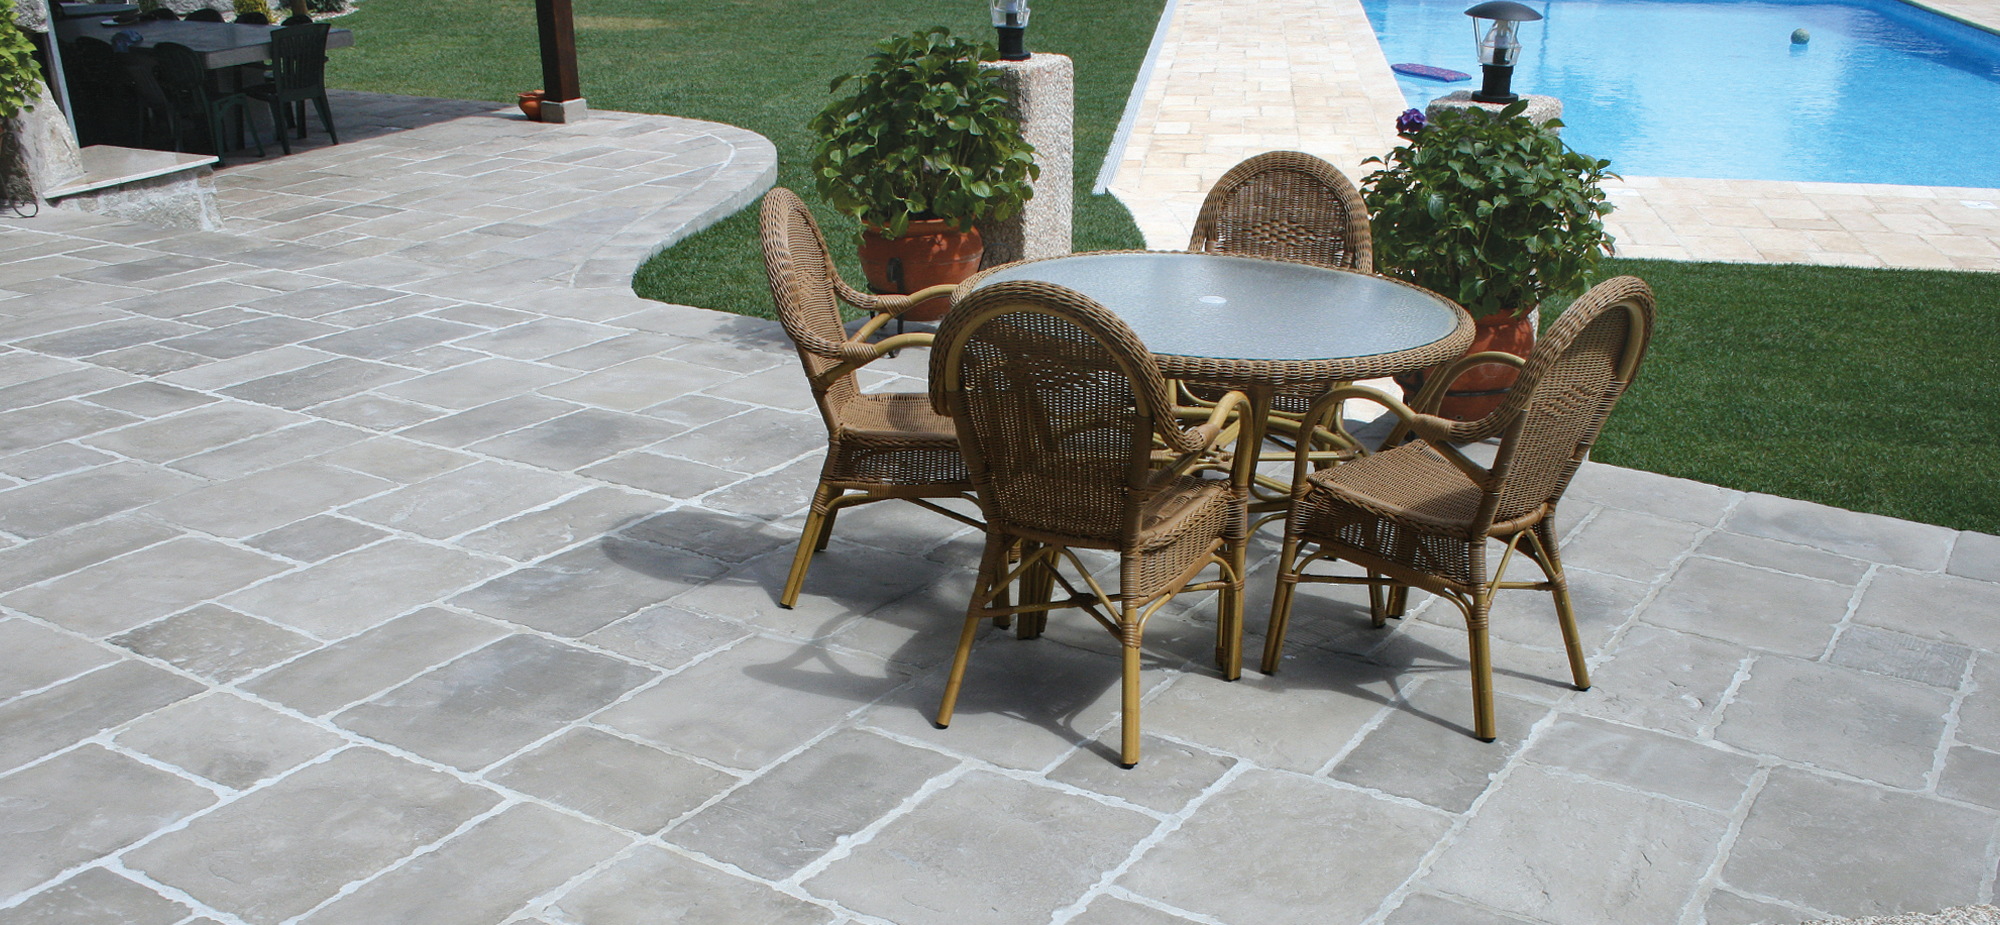 Fabistone pavimentos y revestimientos en piedra natural reconstitu da - Pavimento jardin ...